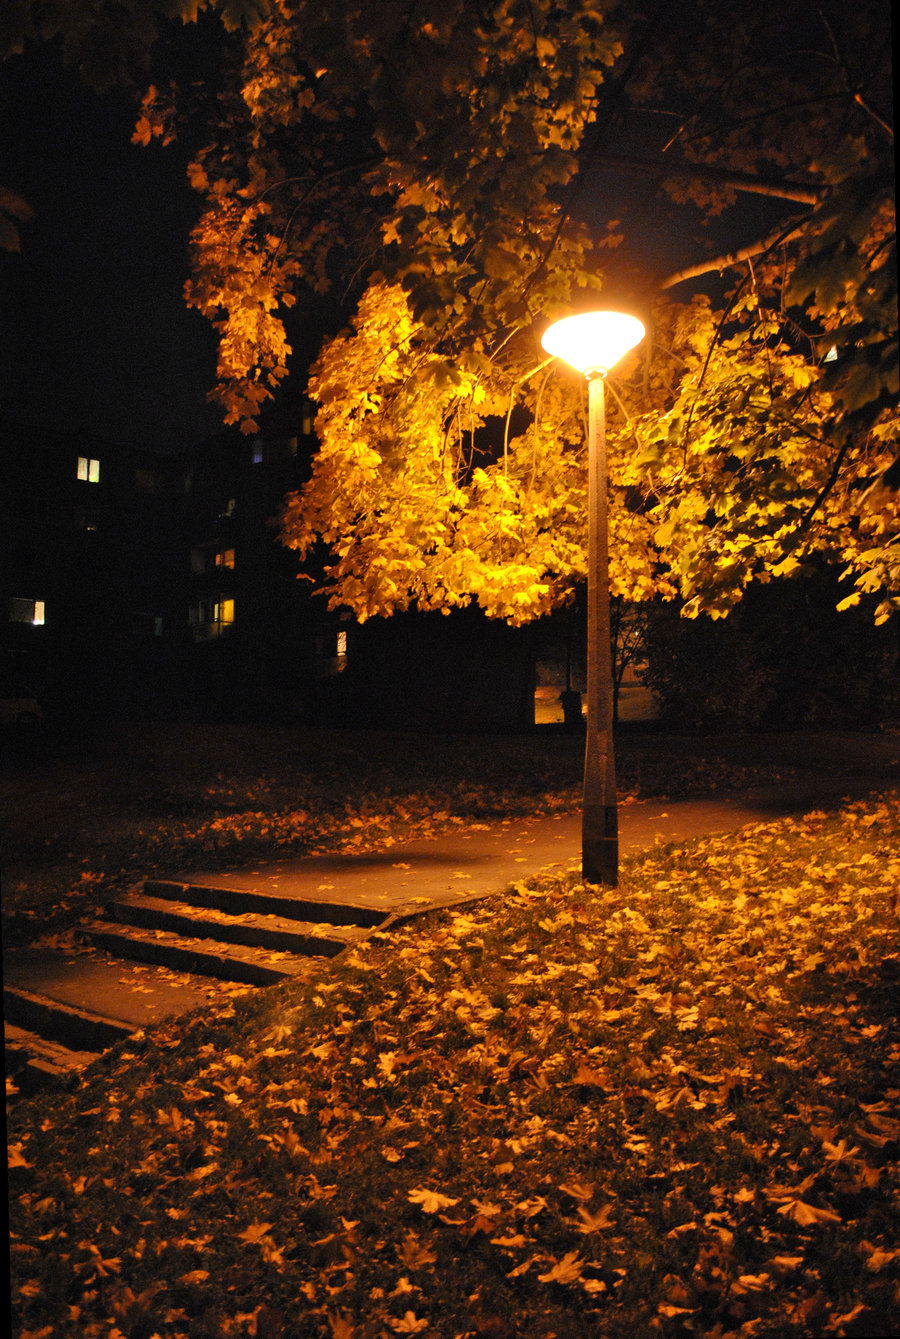 Autumn Night ~ Autumn Posters Picture